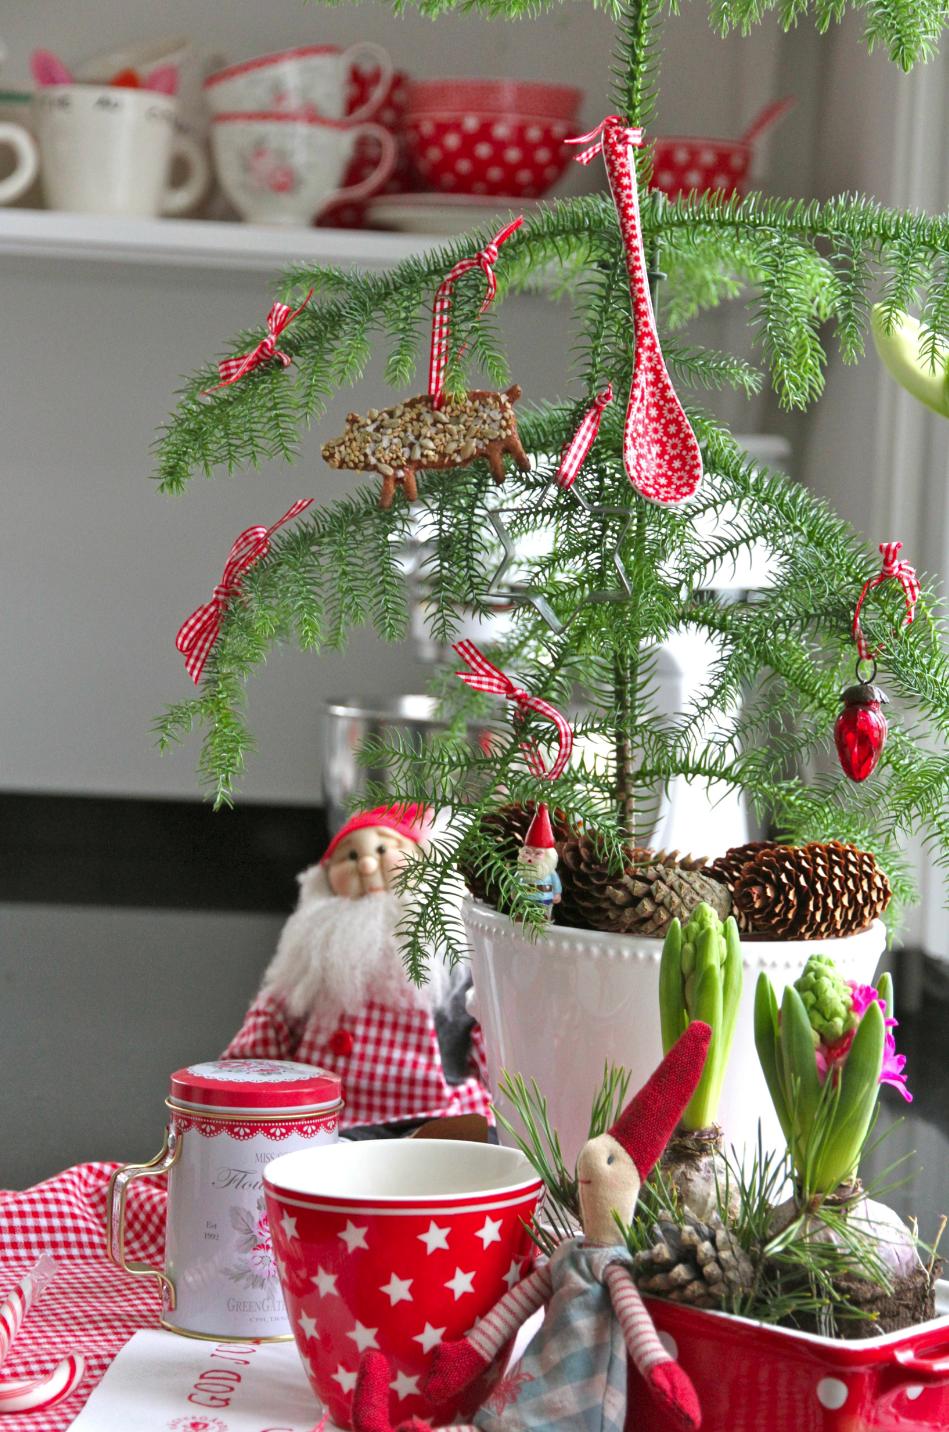 Ckcrackingchristmas Xmas Decorations Christmas Home Scandi Christmas